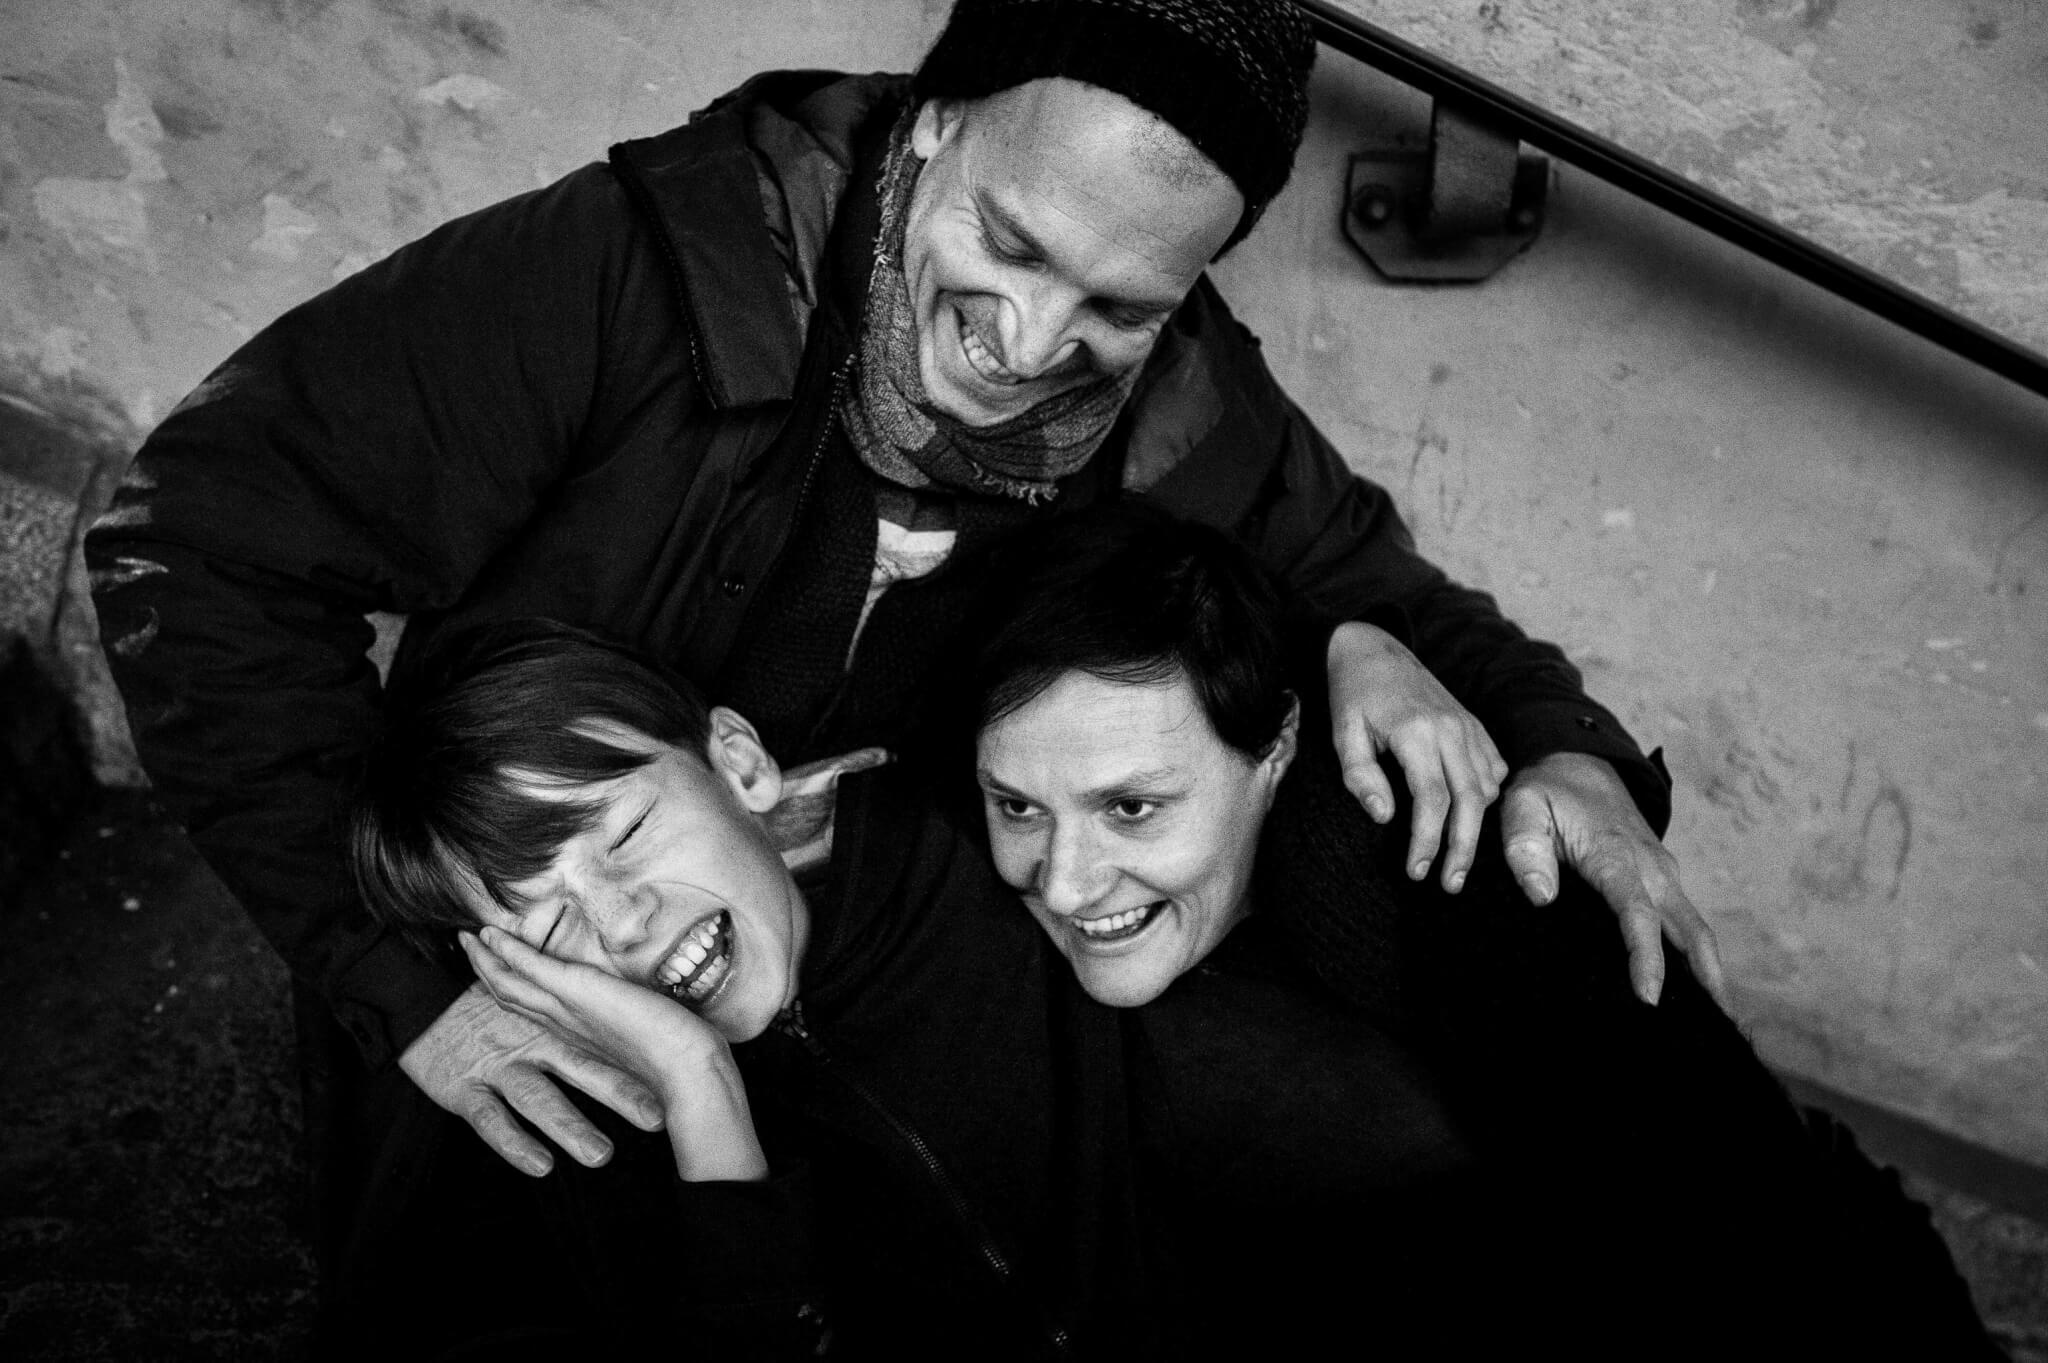 foto mama papa en zoon knuffel lachen. familieportret, portretfotografie. gezinsfoto